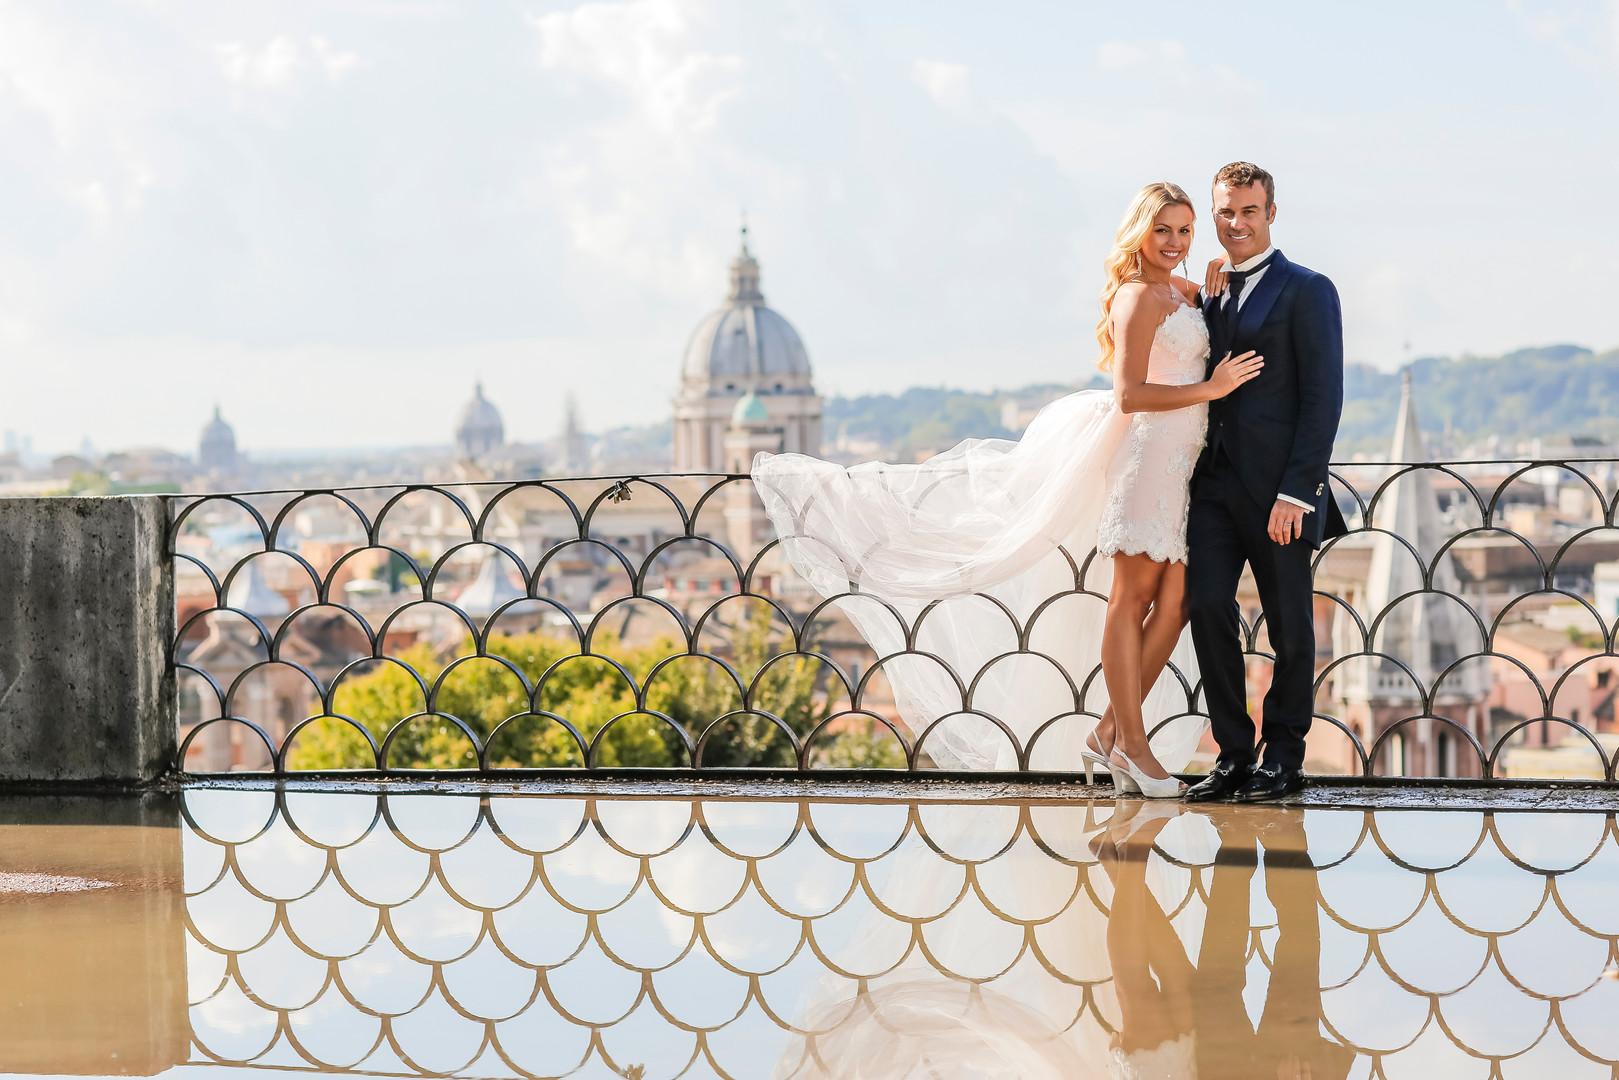 Фото 37 свадьба в Италии. Катрин и Анжело. Katrin Moro Weddings